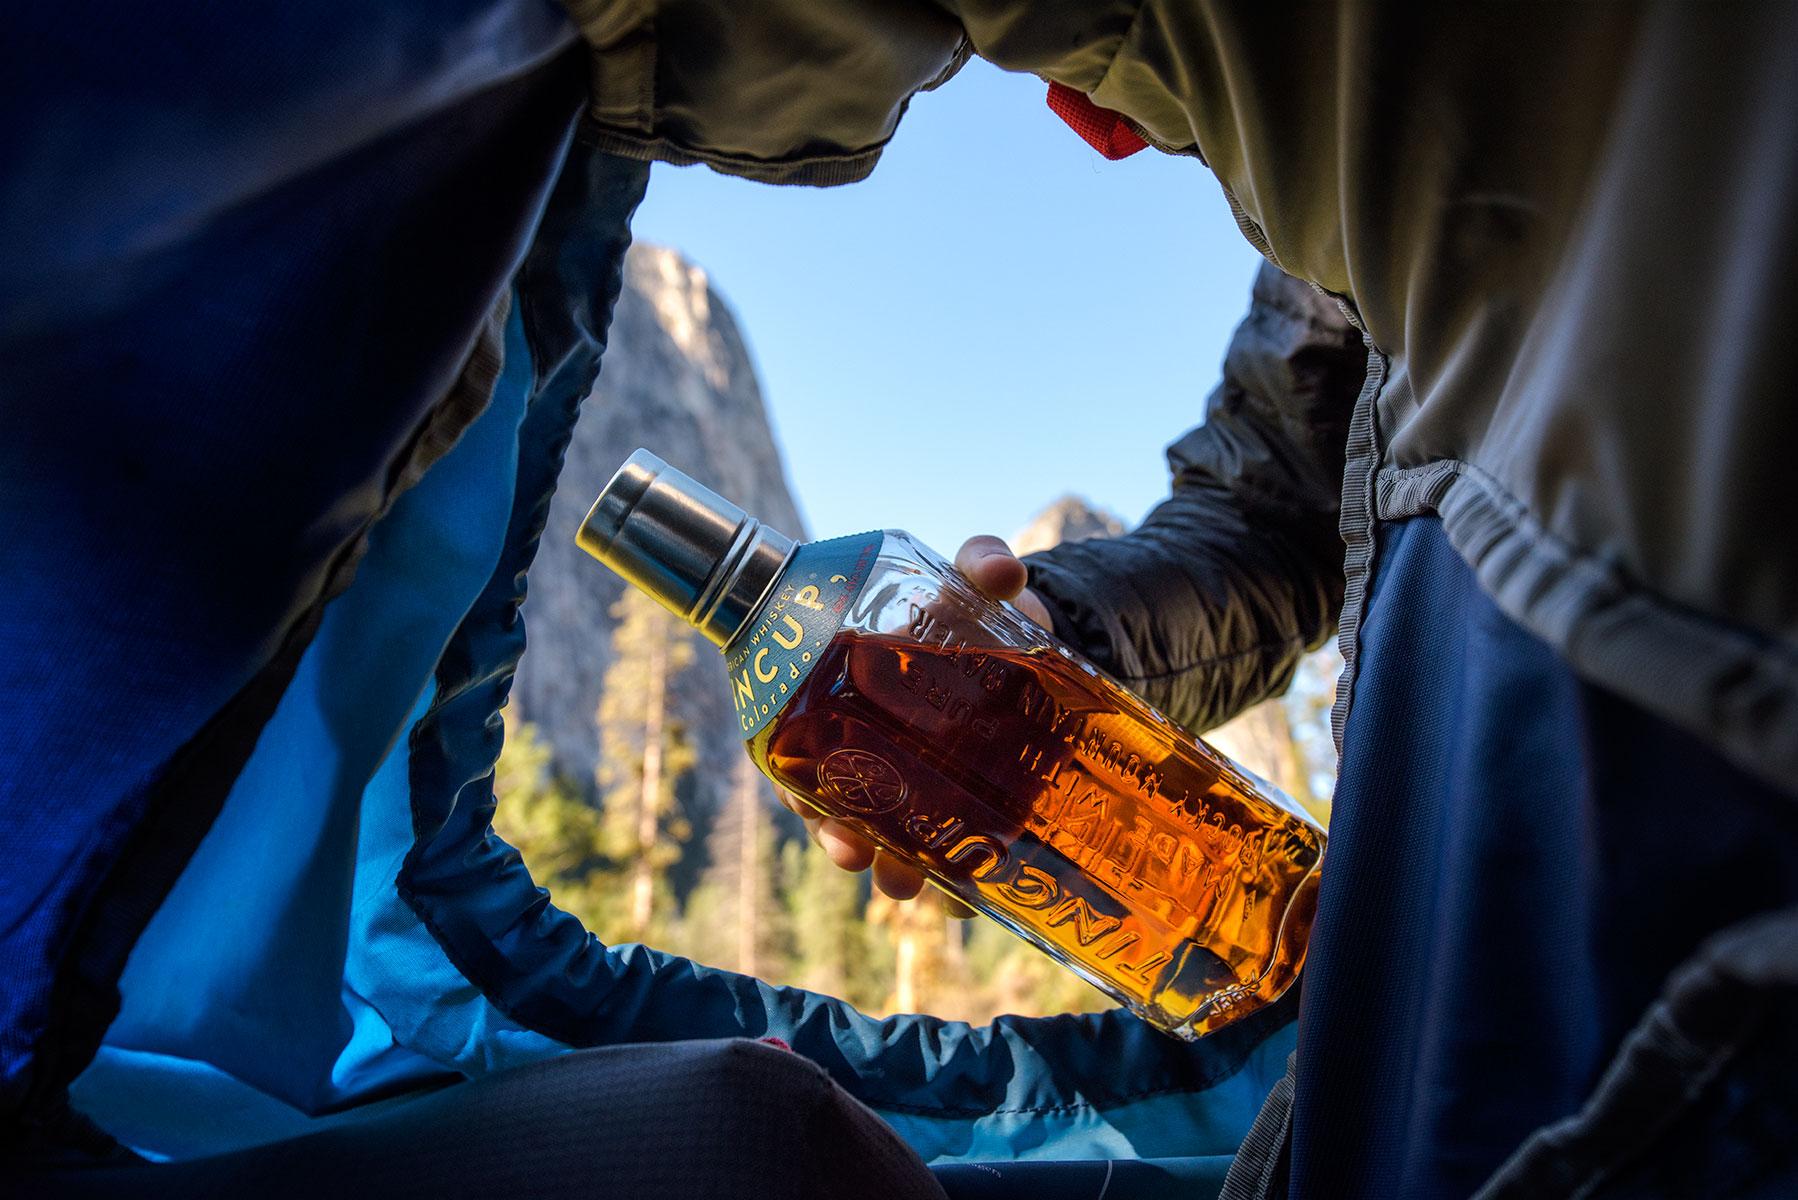 austin-trigg-whiskey-yosemite-product-TINCUP-El-Capitan-Meadow-Packing-backpack.jpg